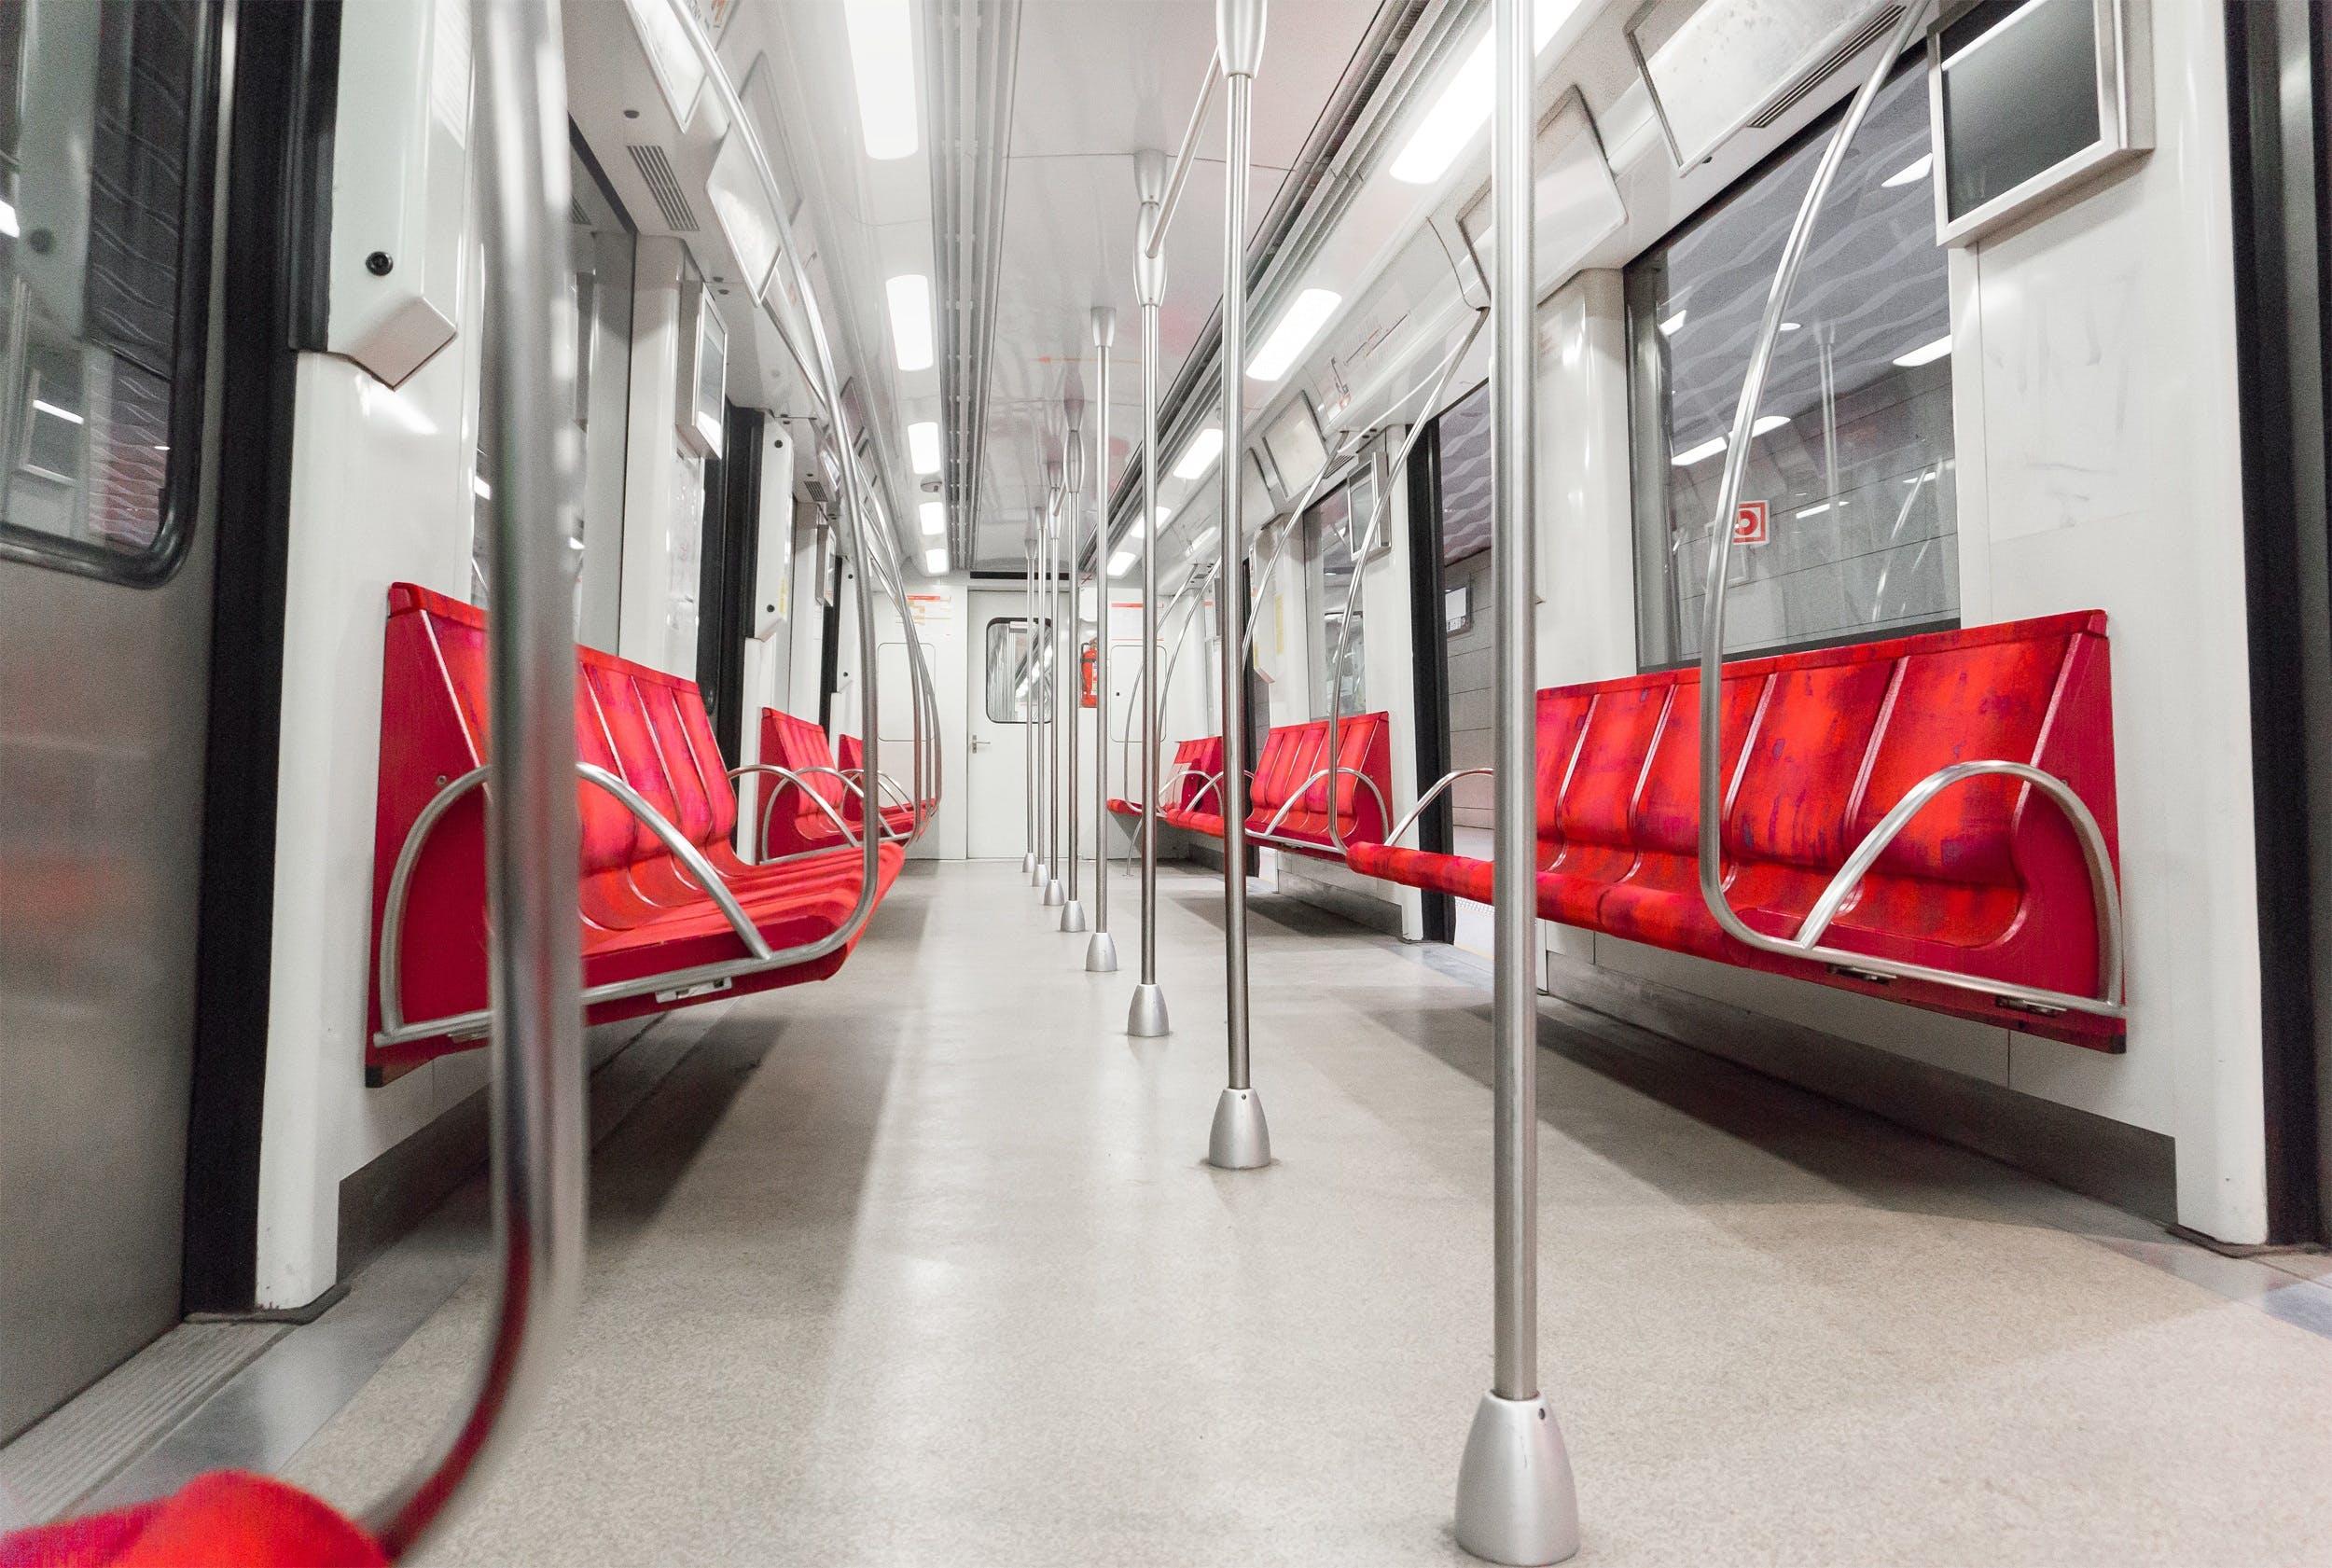 chairs, metal, public transportation